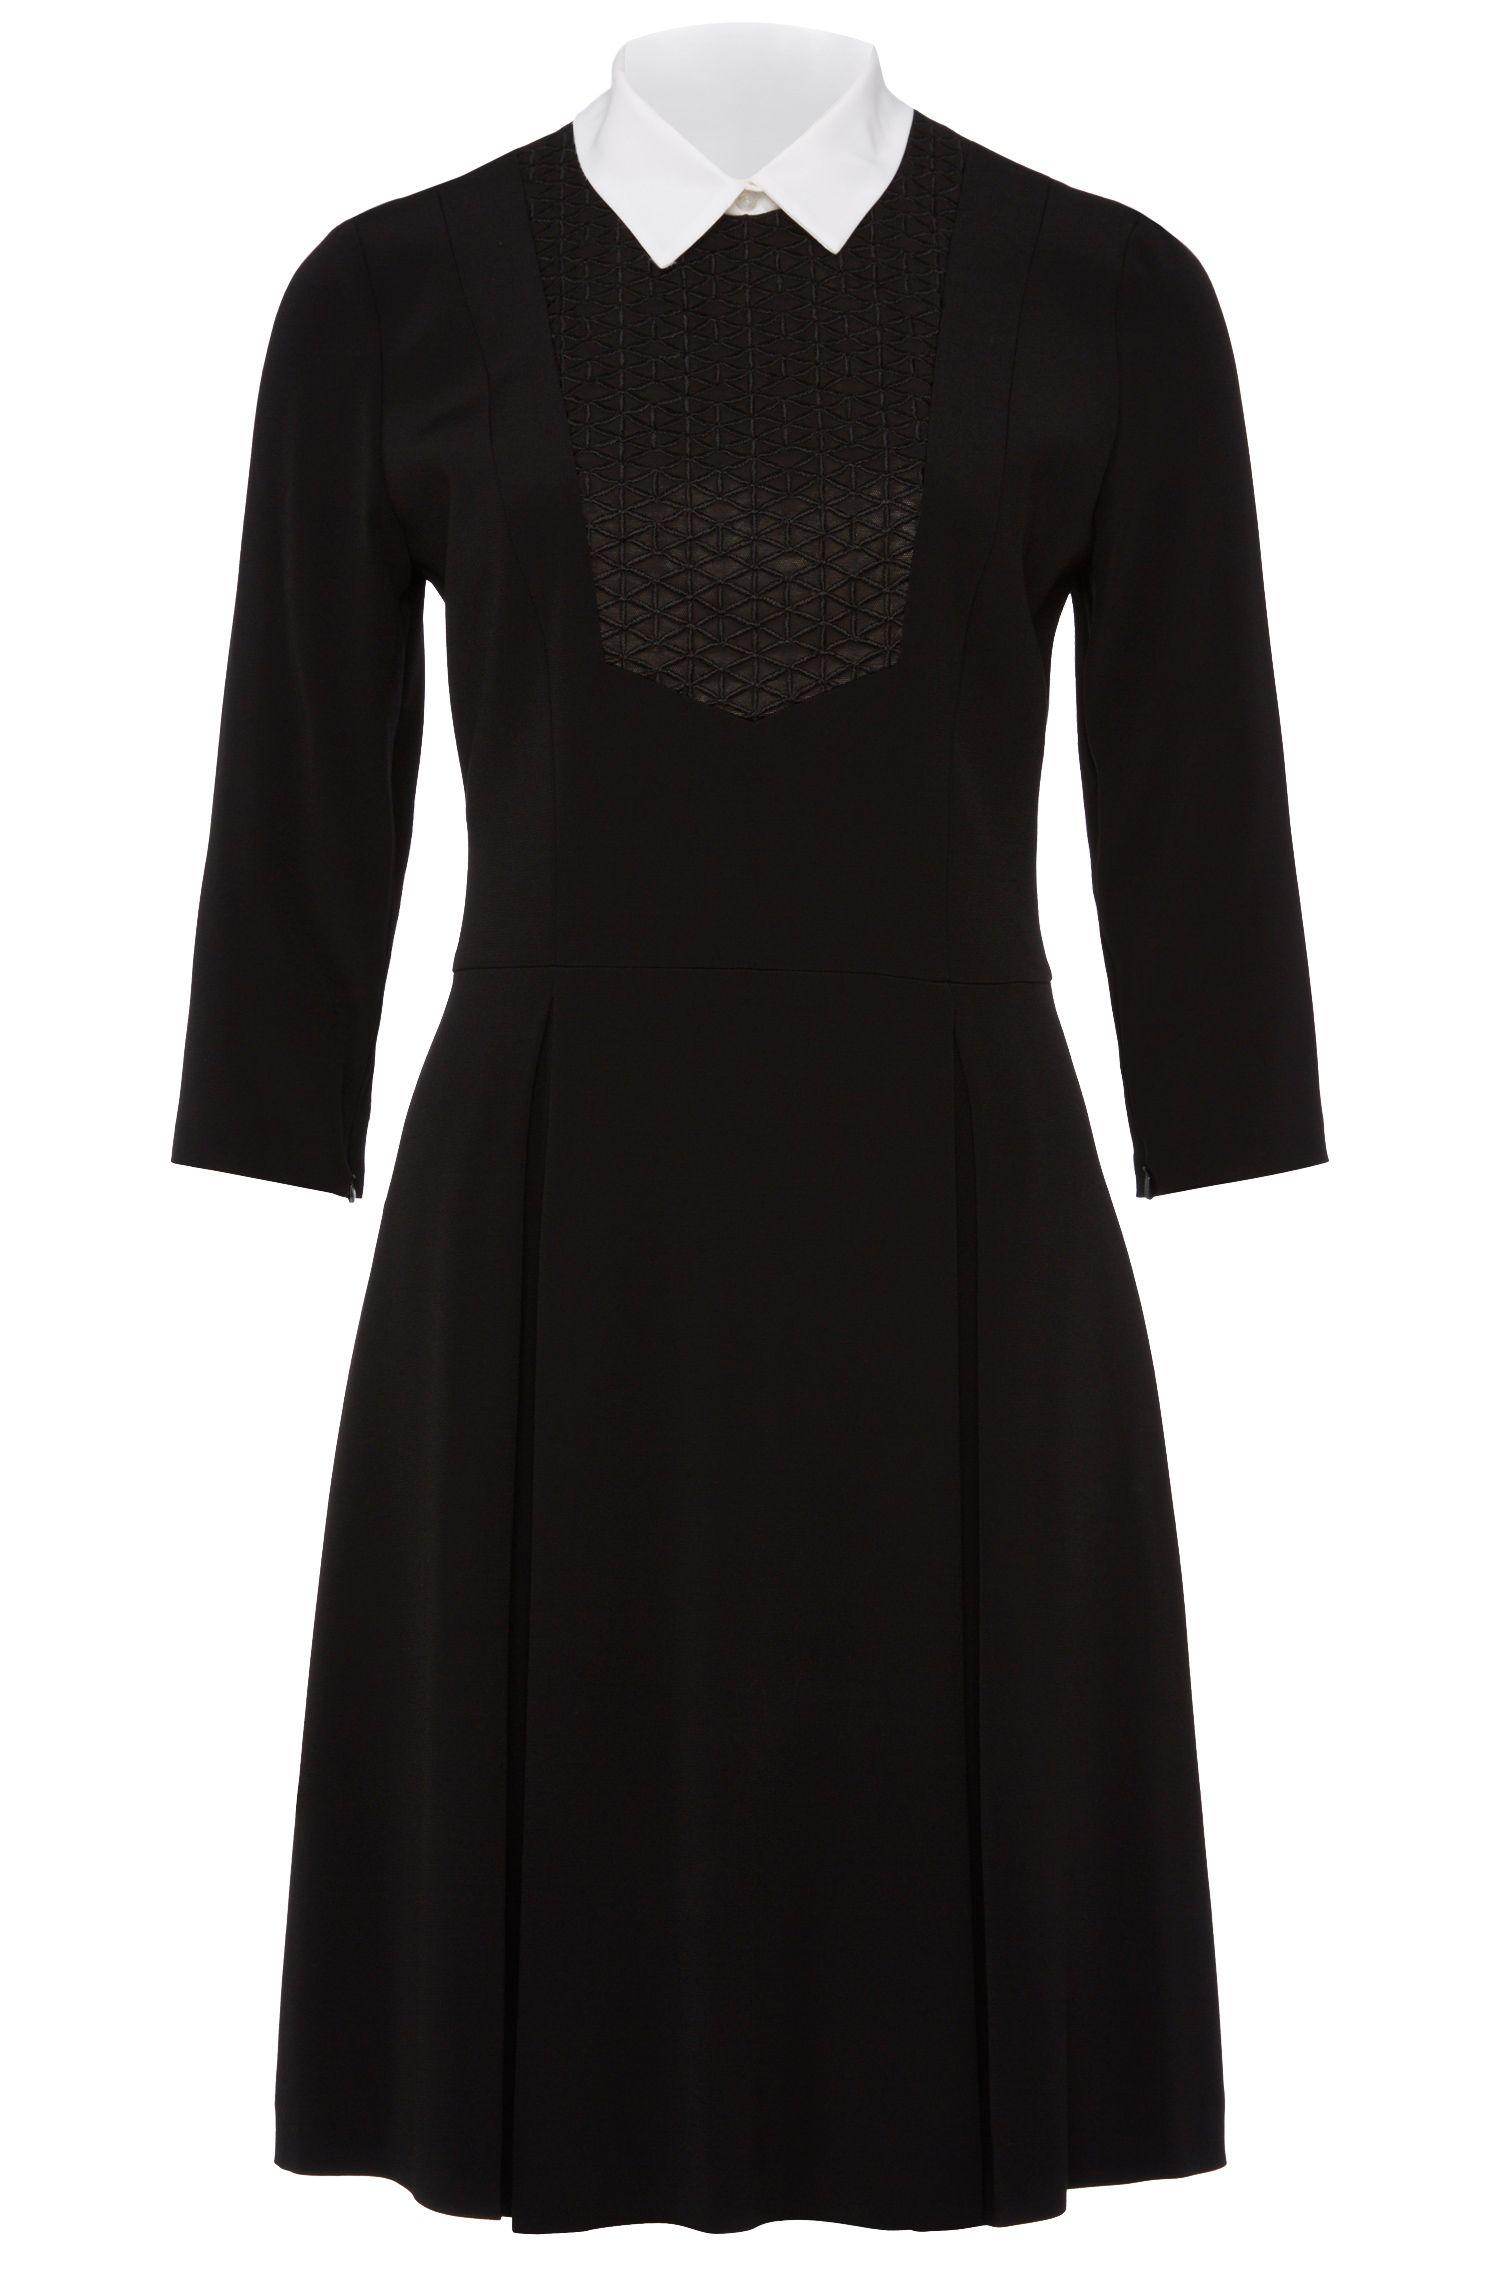 'Kalua'   A-line Textured Dress, Detachable Collar